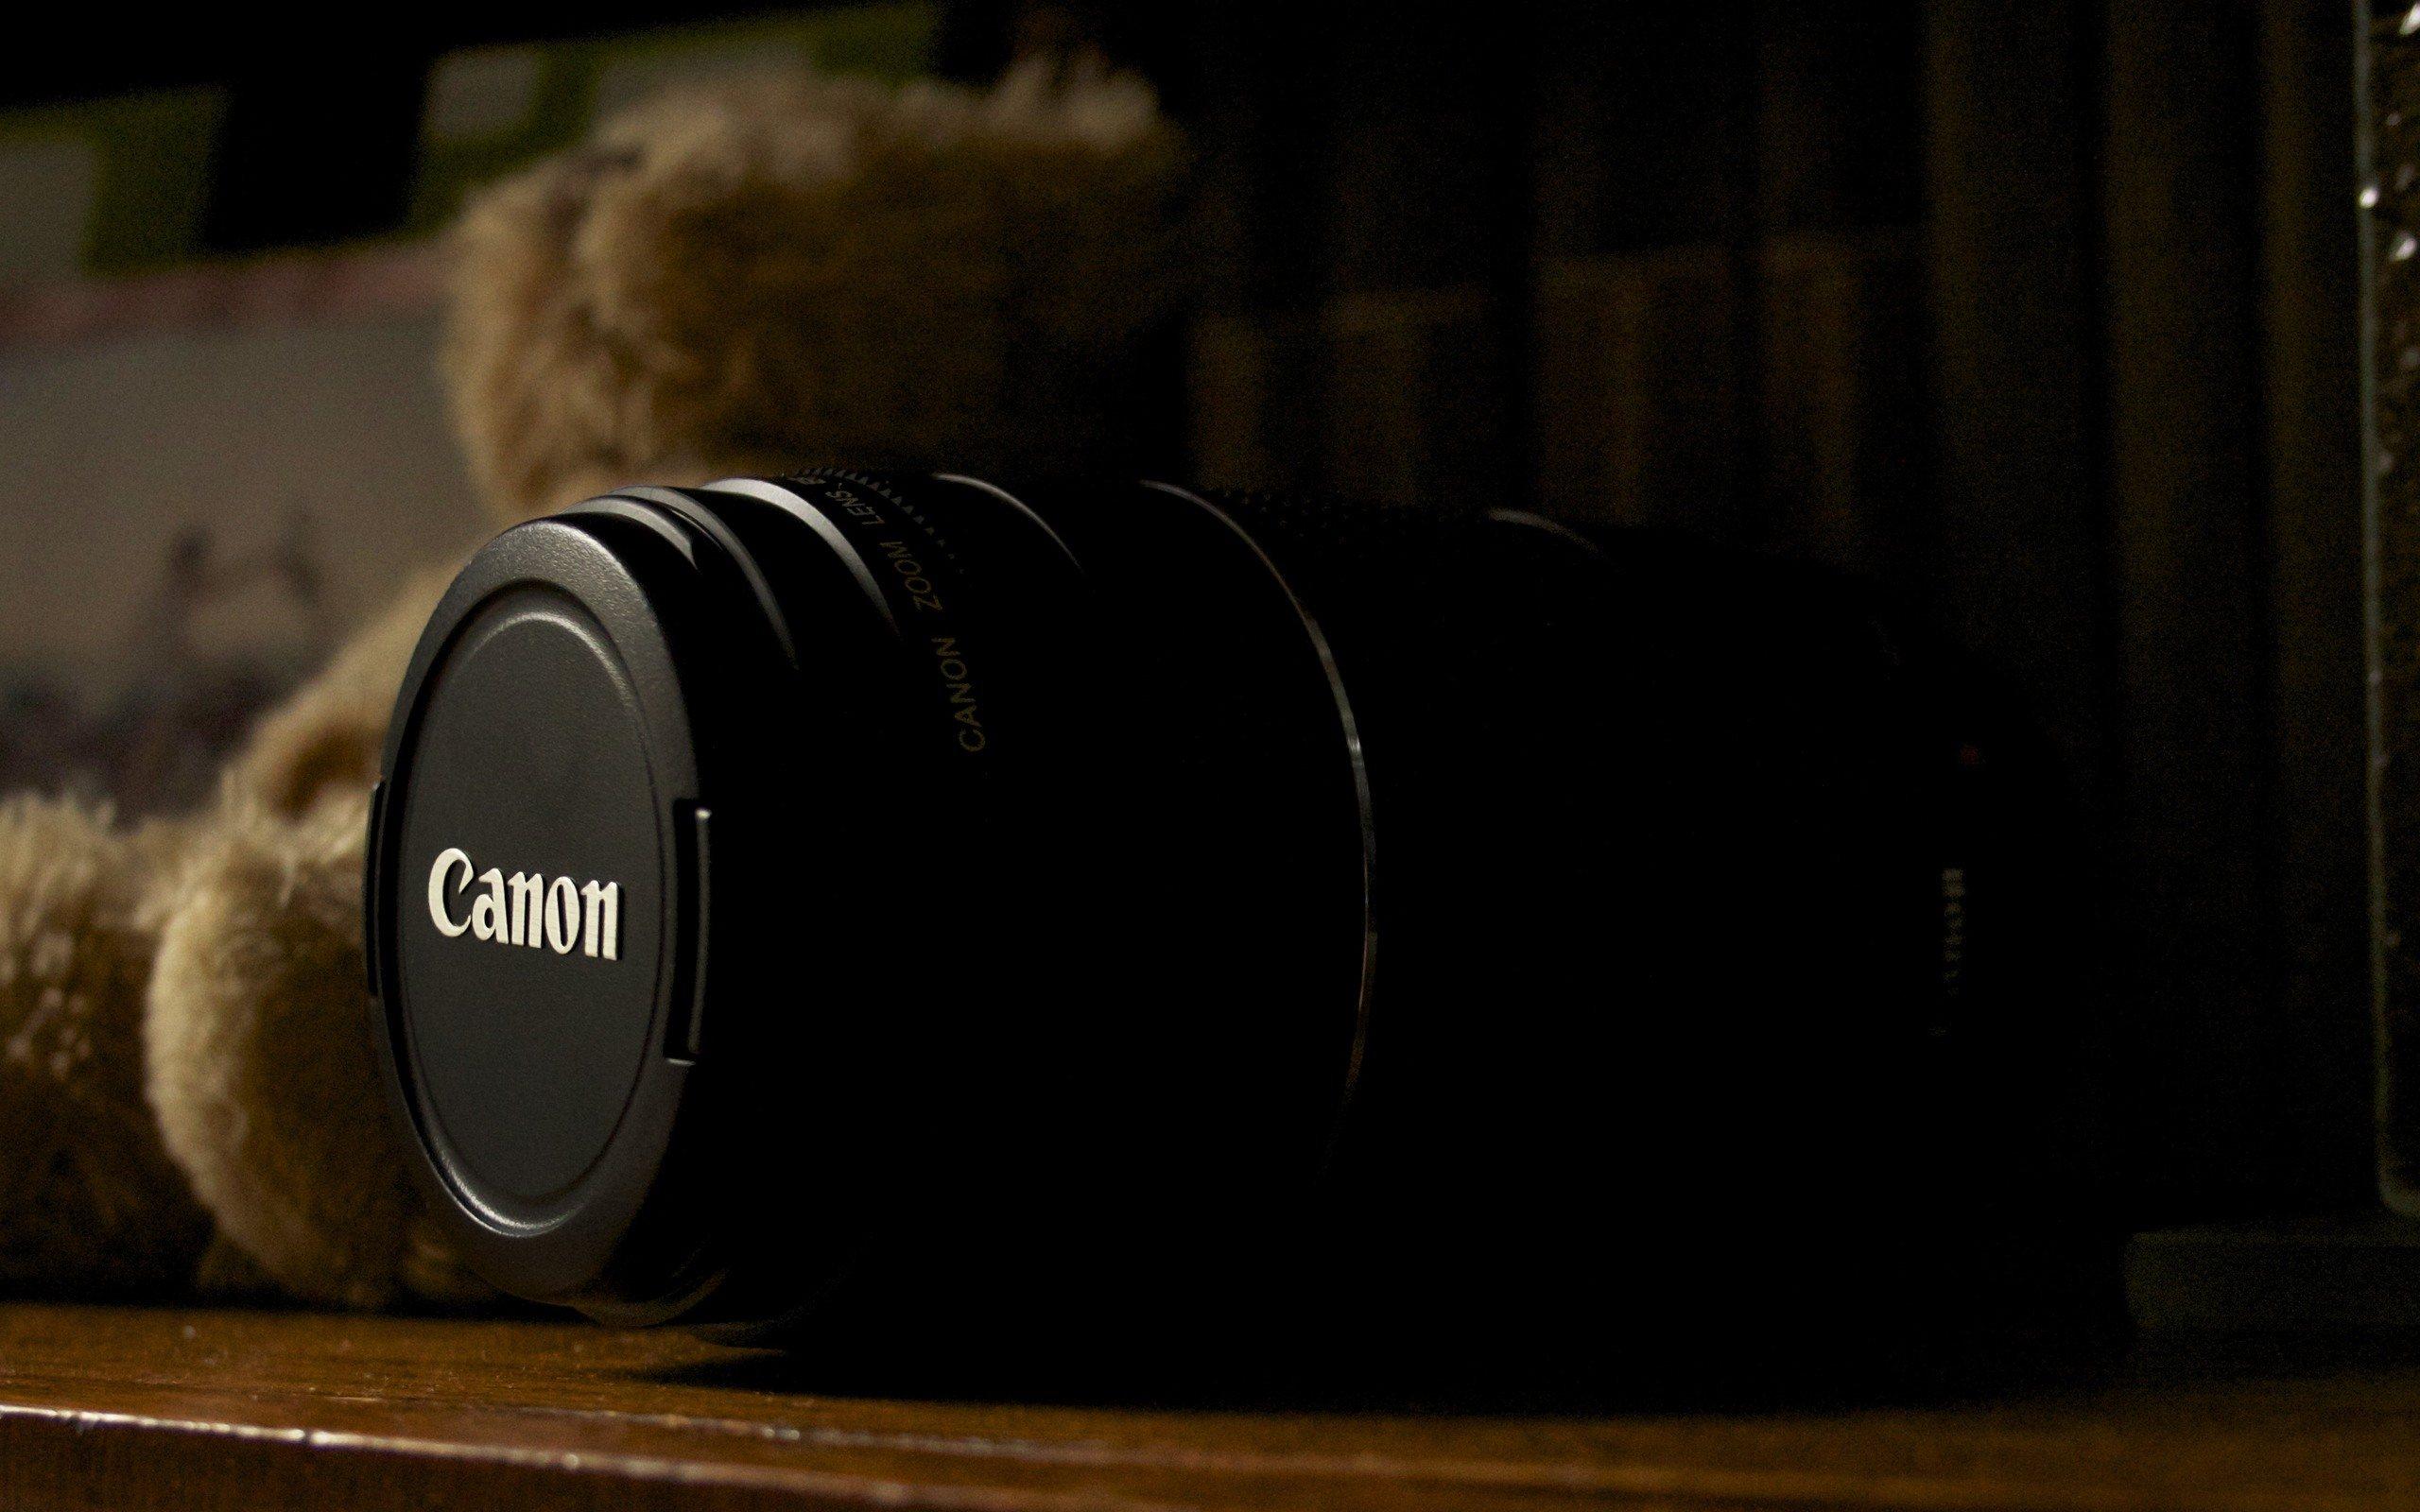 Canon Macro Photography Wallpaper Brands Wallpaper Background Photo 2560x1600